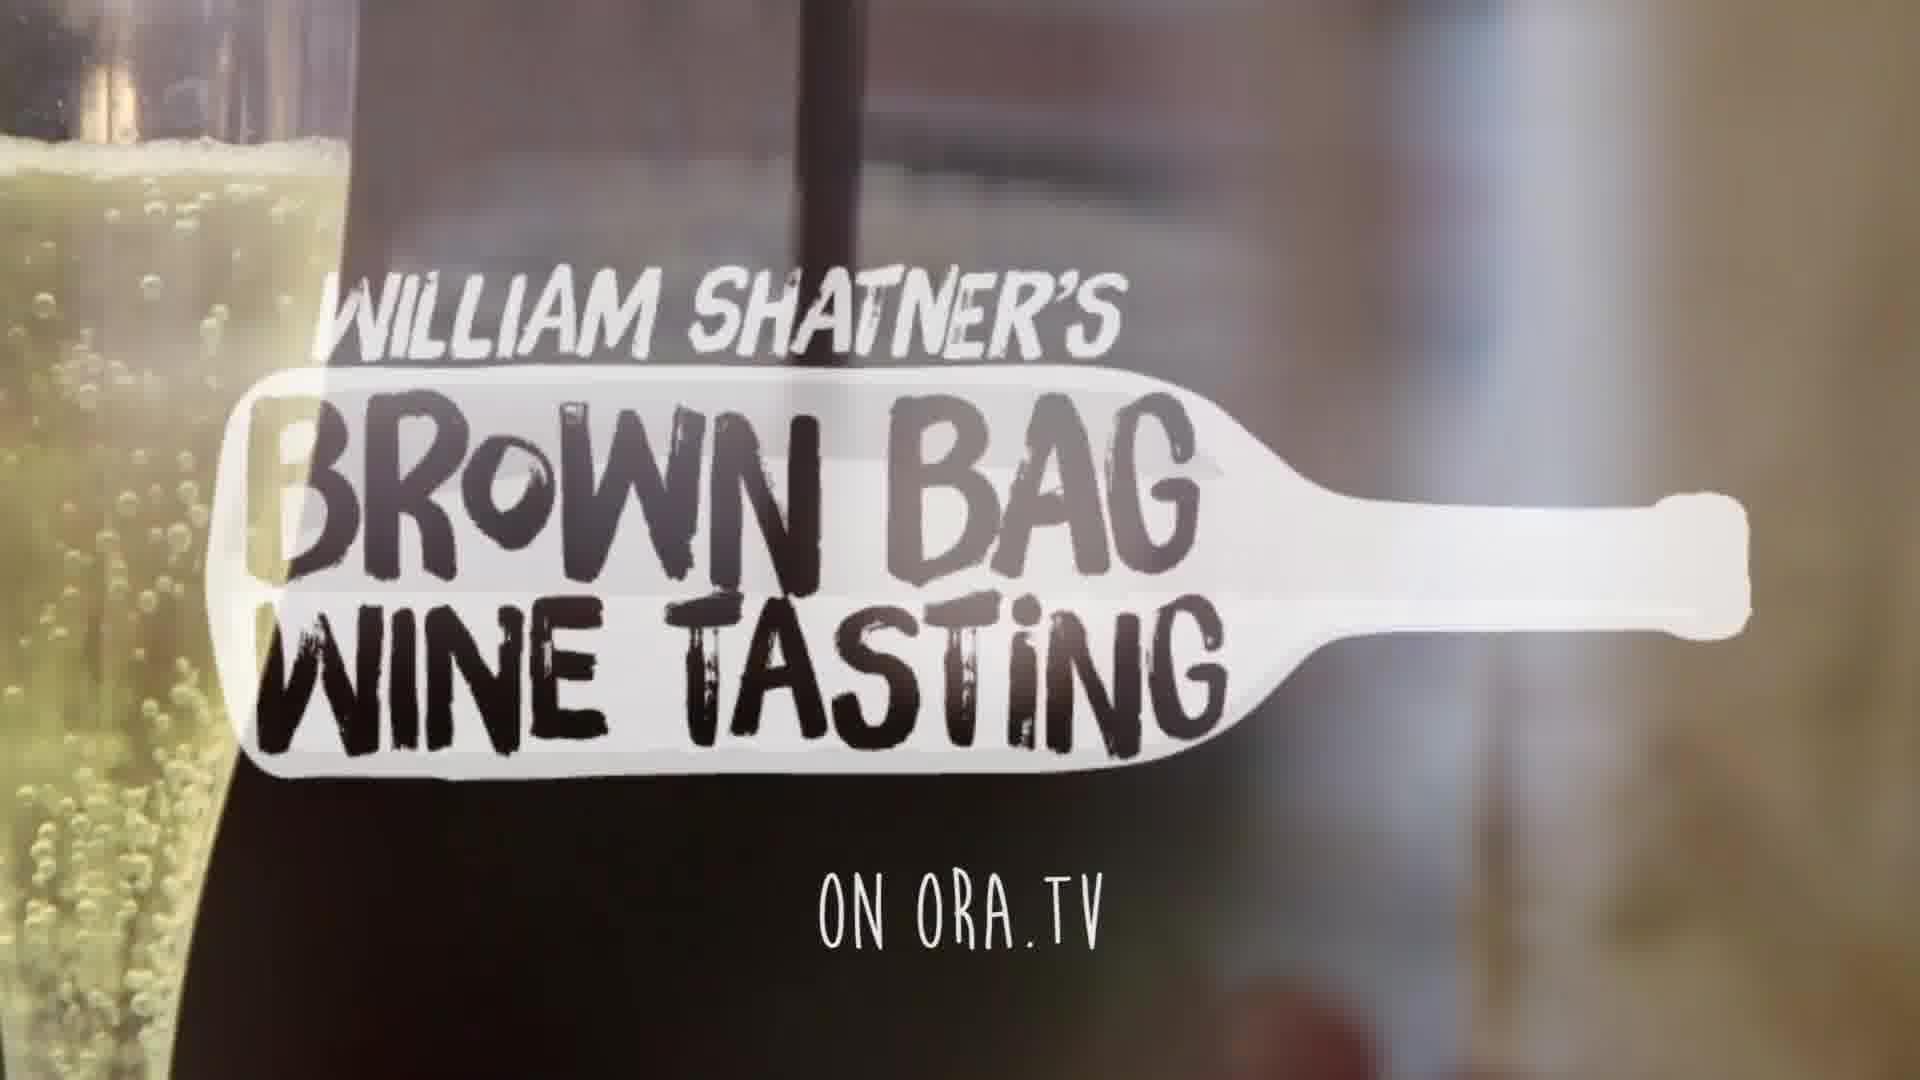 Brown Bag Wine Tasting with William Shatner on OraTV